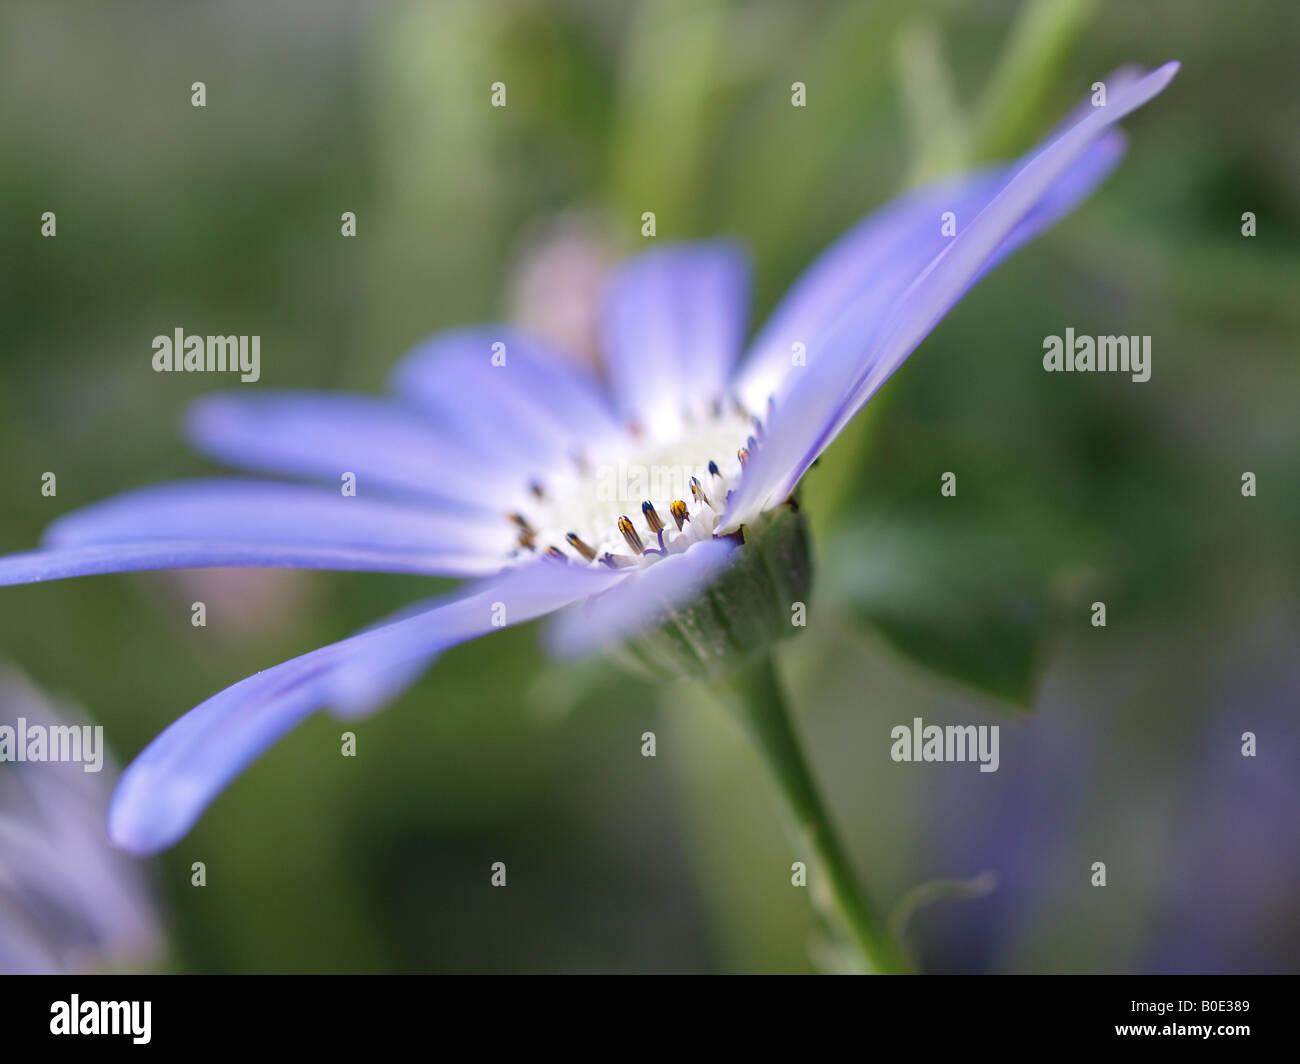 lilac senetti flower in garden - Stock Image